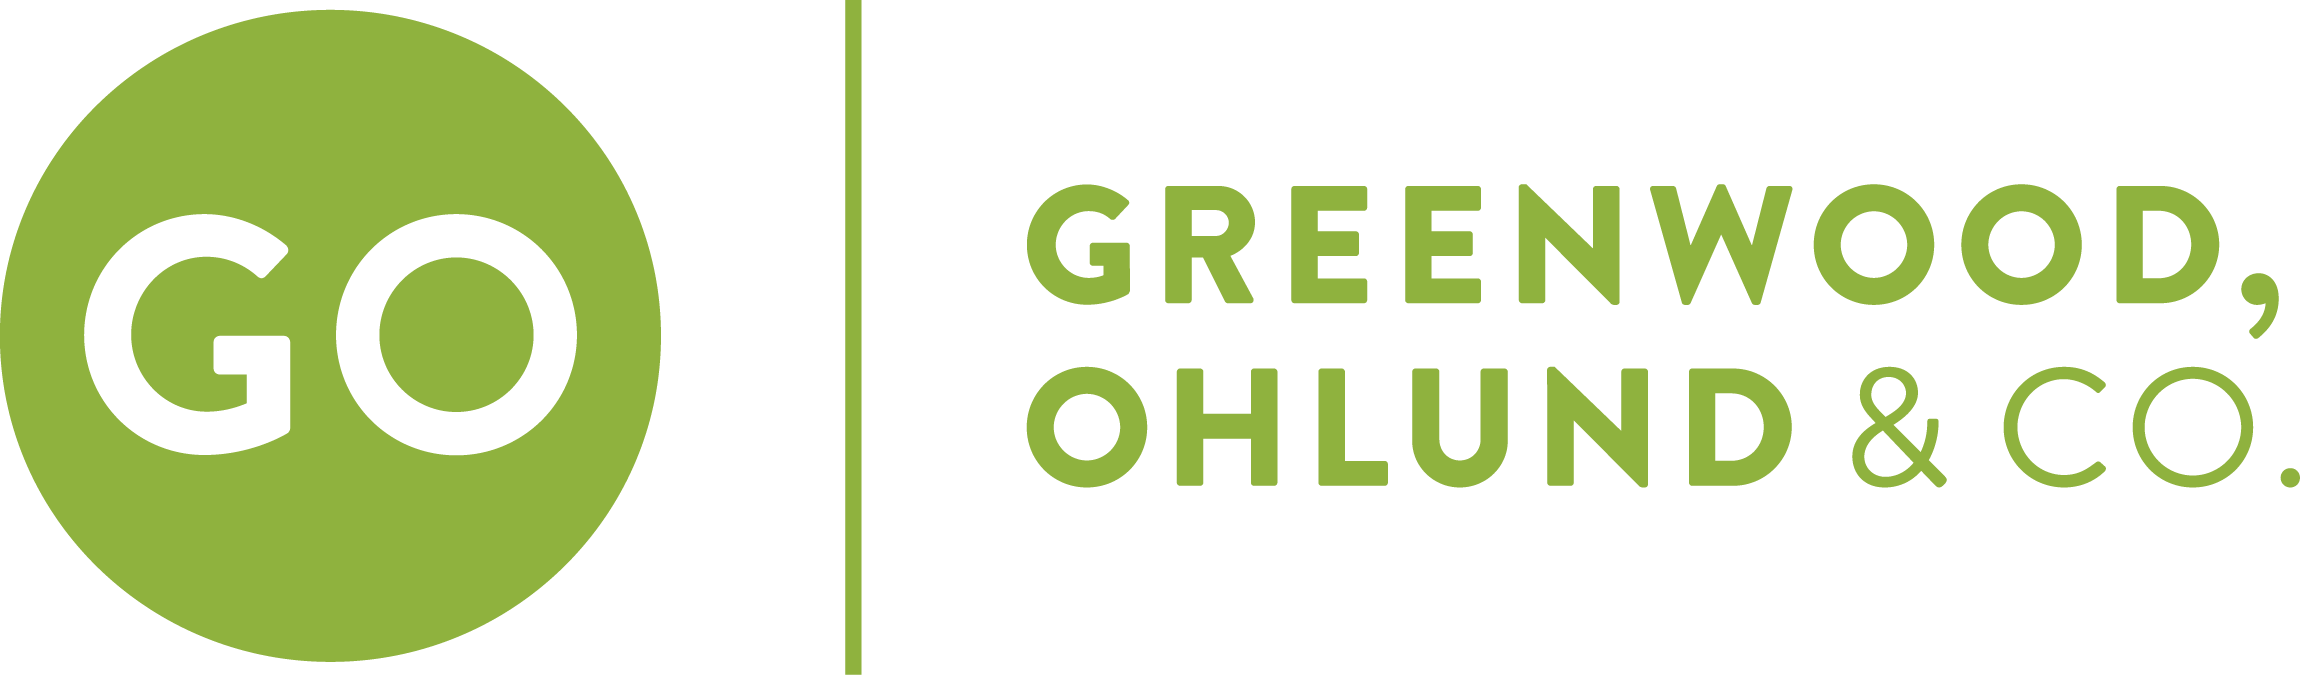 Greenwood Ohlund & Co.